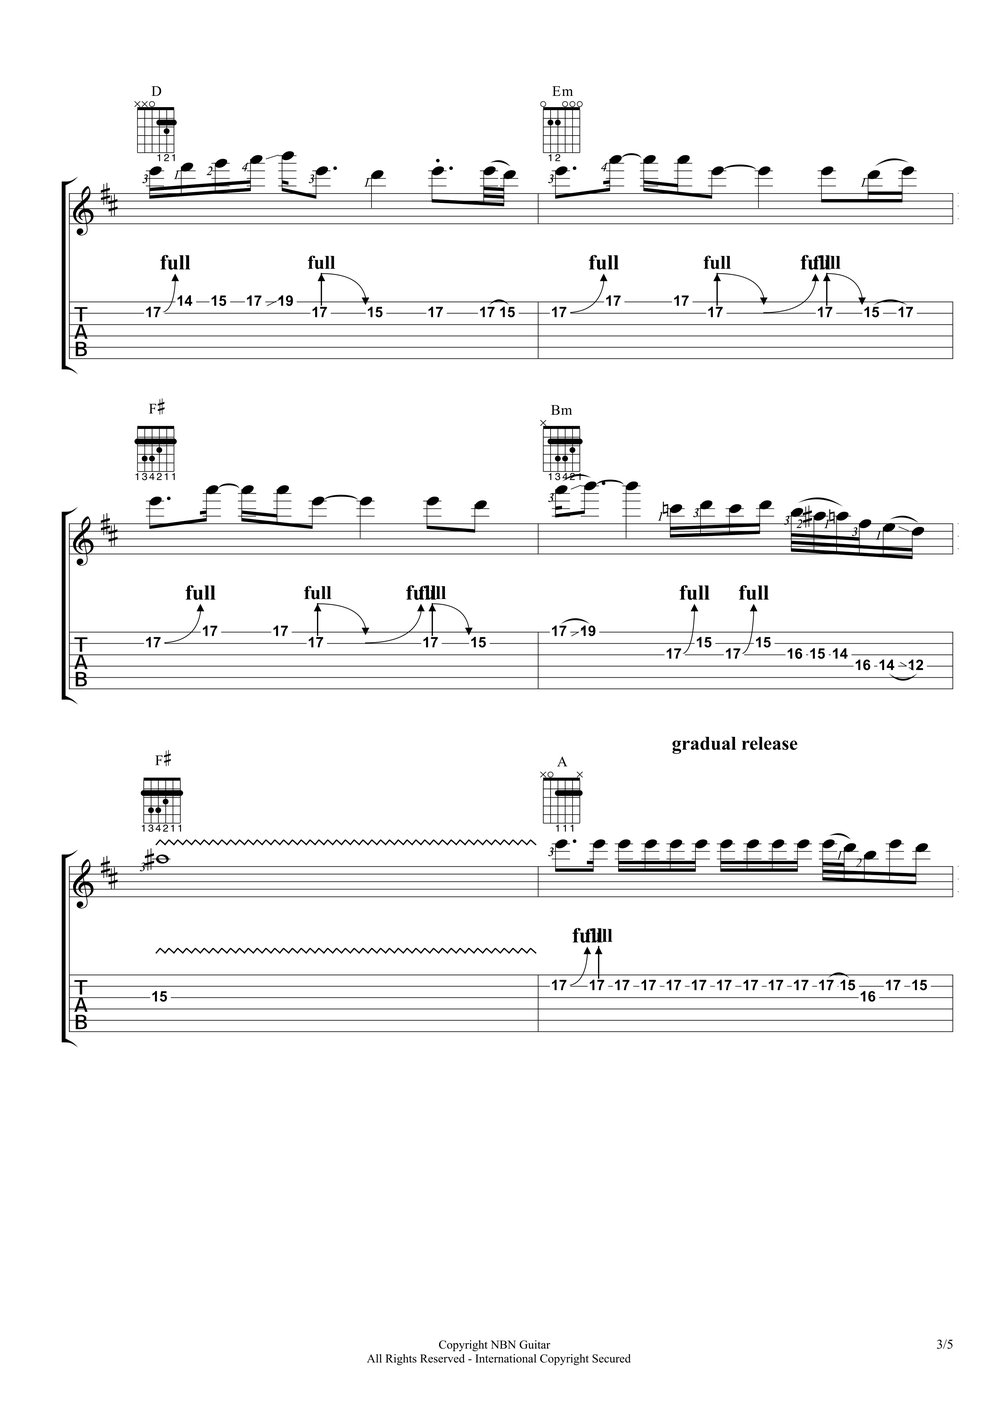 Hotel California Solo Sheet Music & Tabs (Acoustic)-p3.jpg